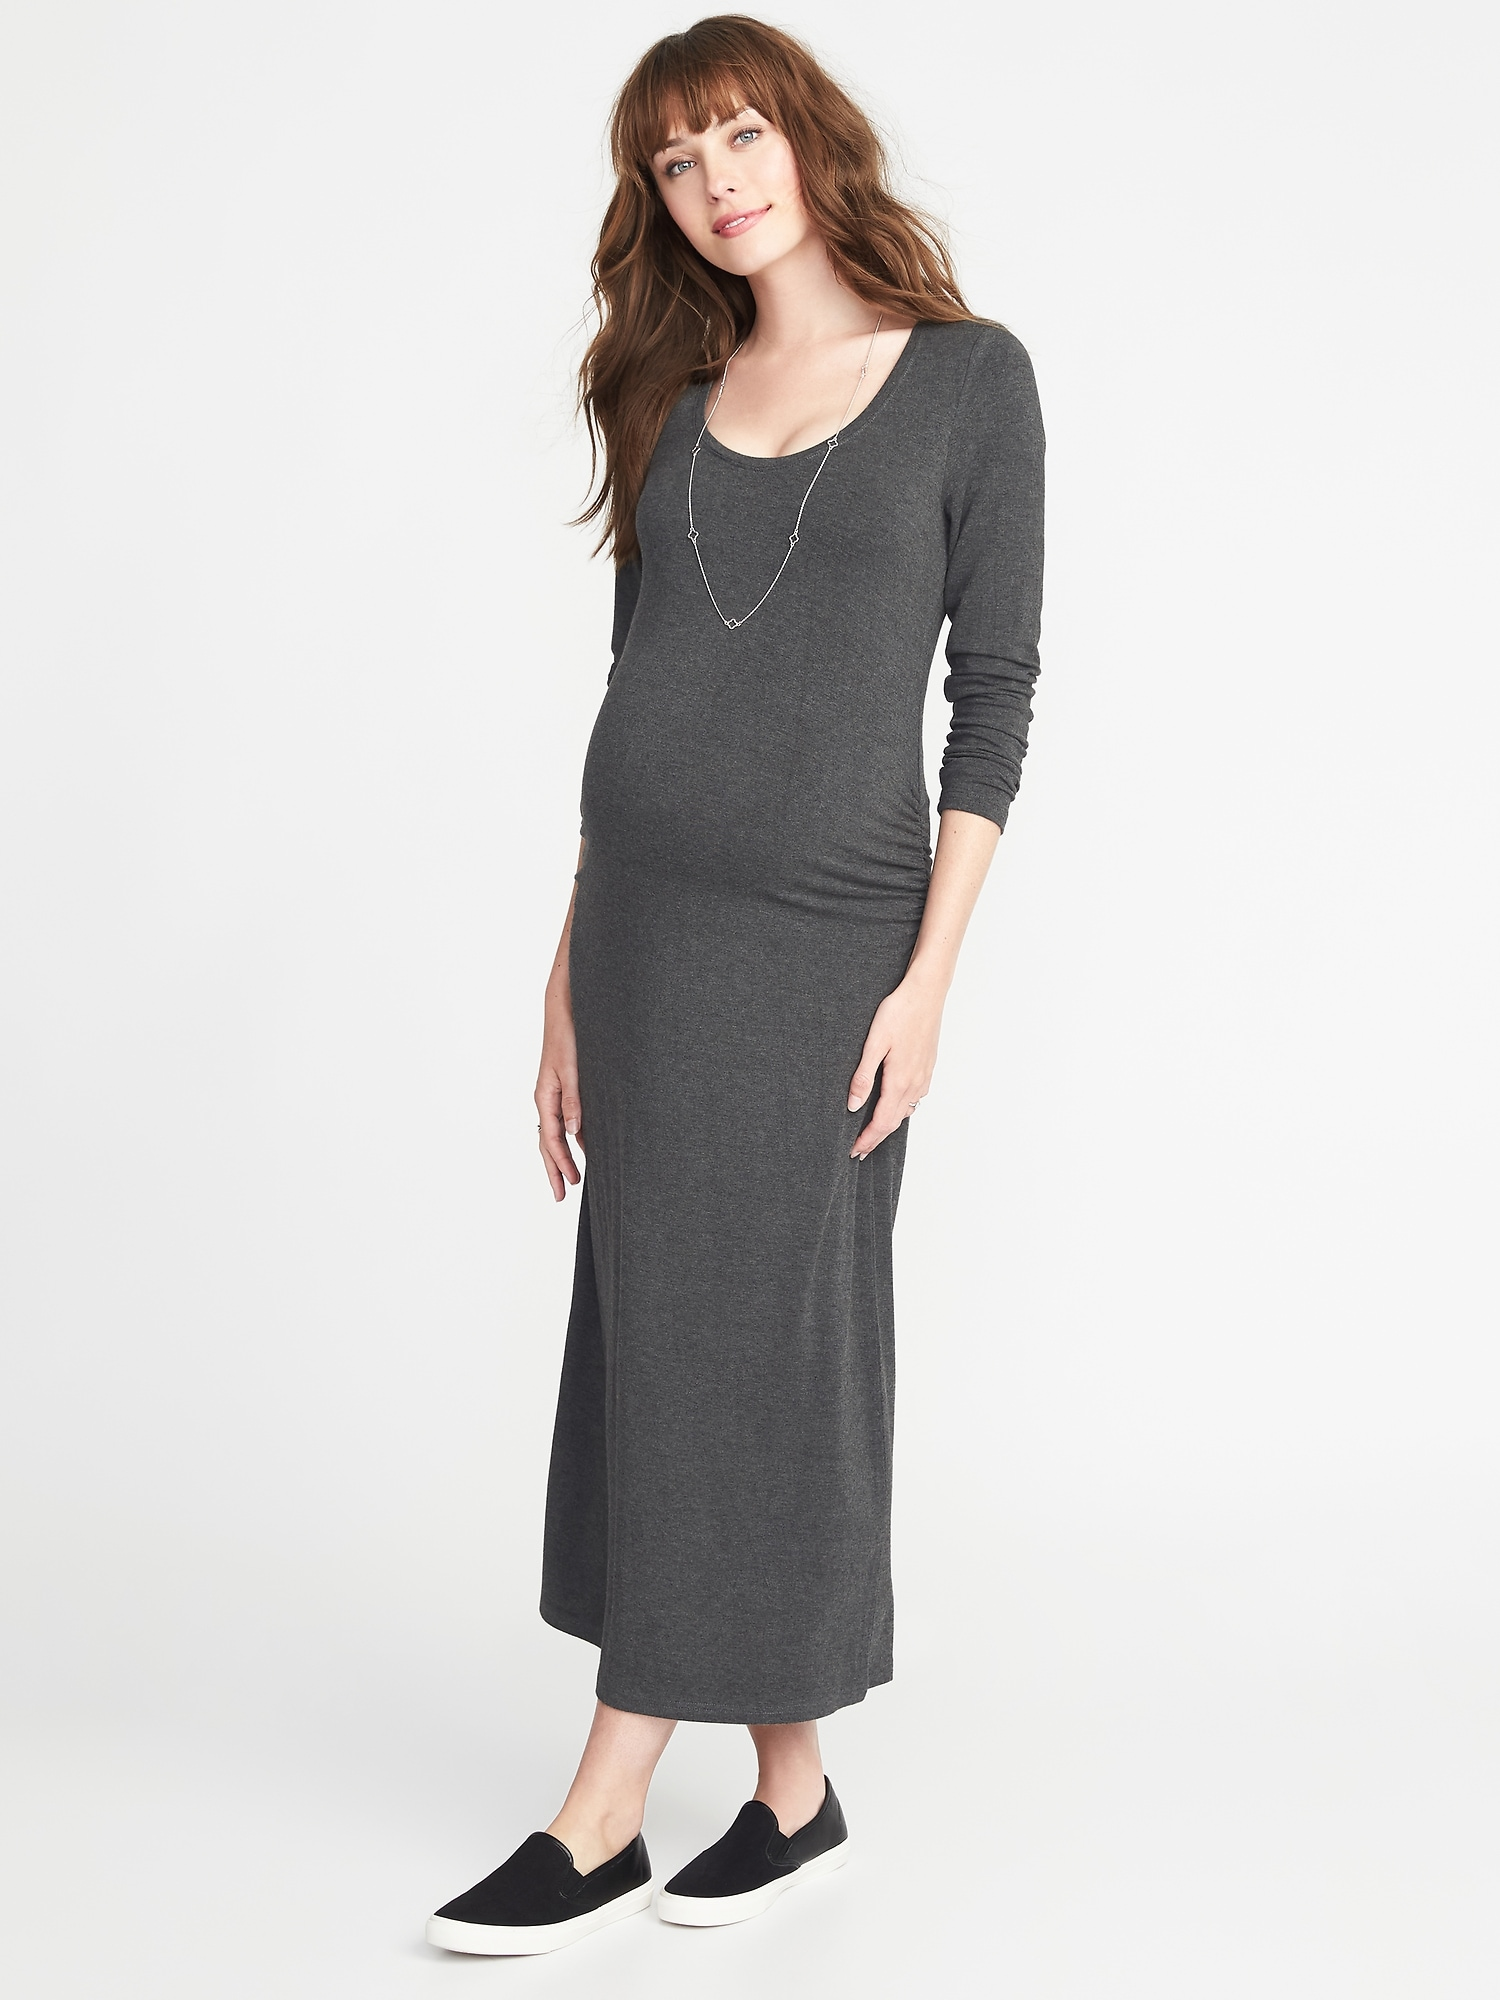 8aacbaf8da0 Maternity Scoop-Neck Jersey Maxi Dress